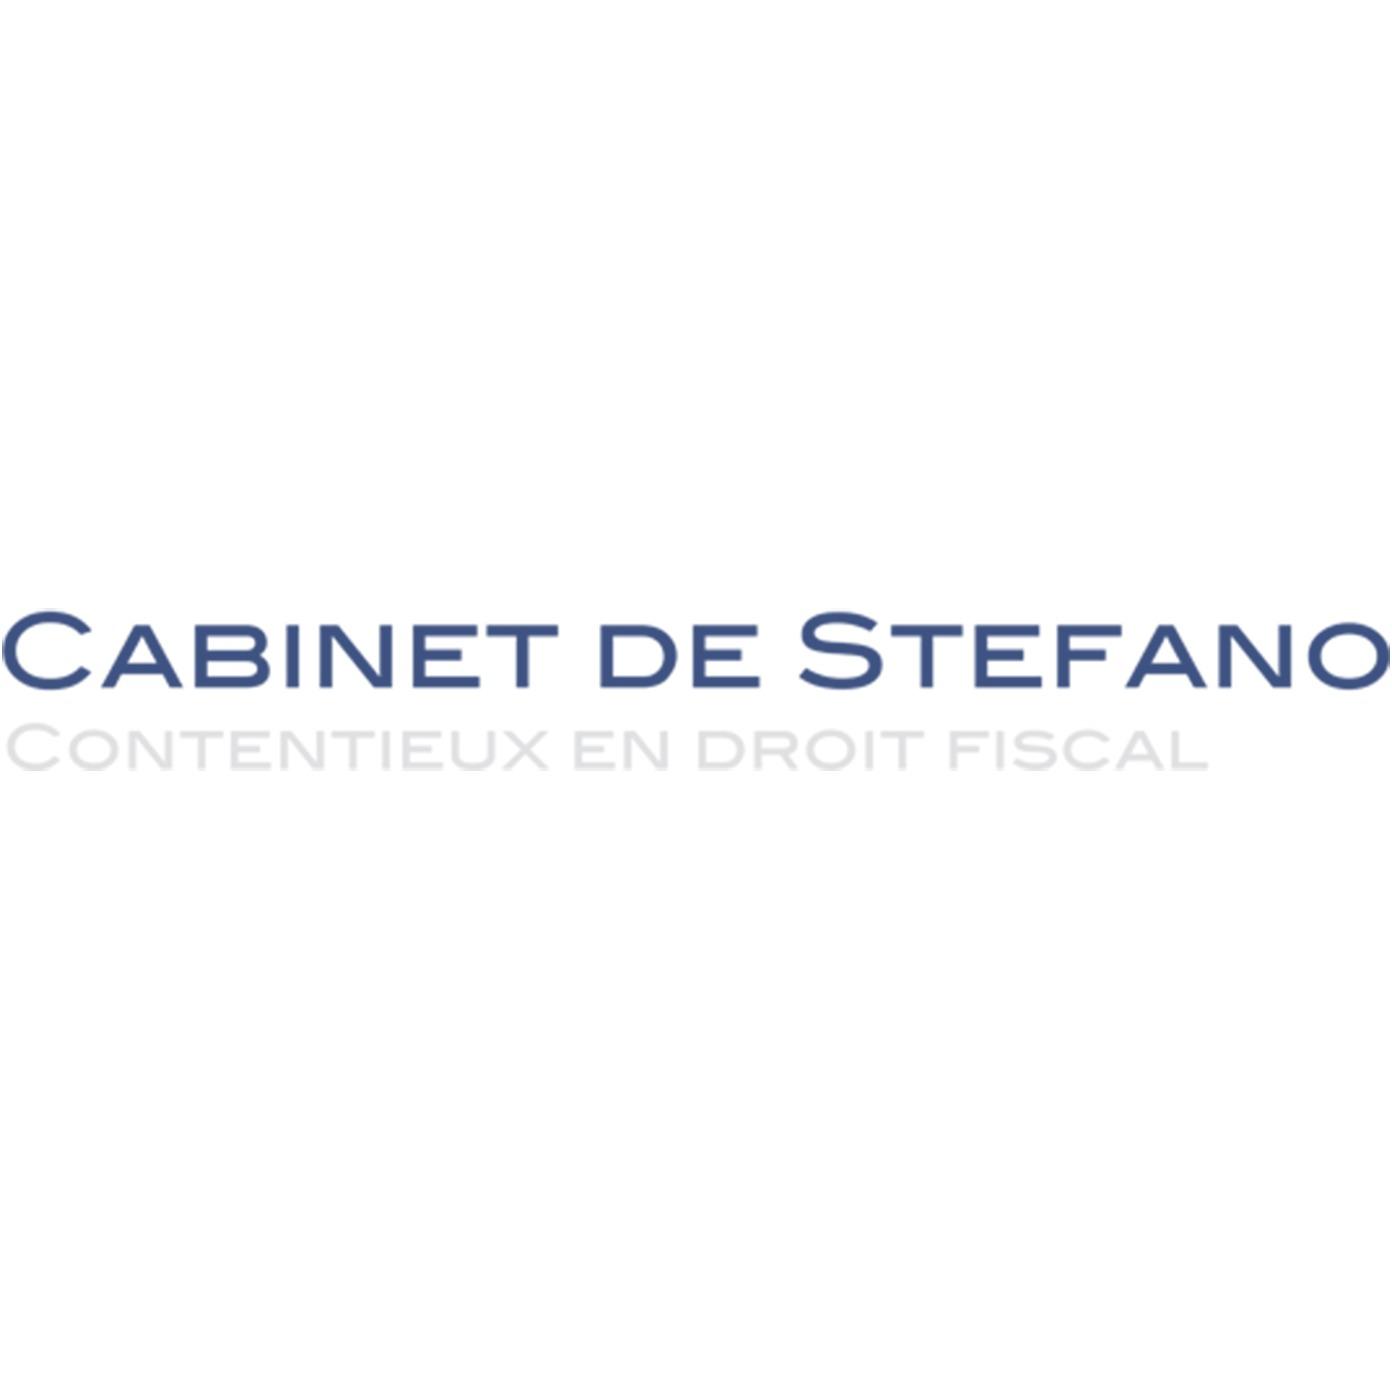 the Cabinet De Stefano logo.